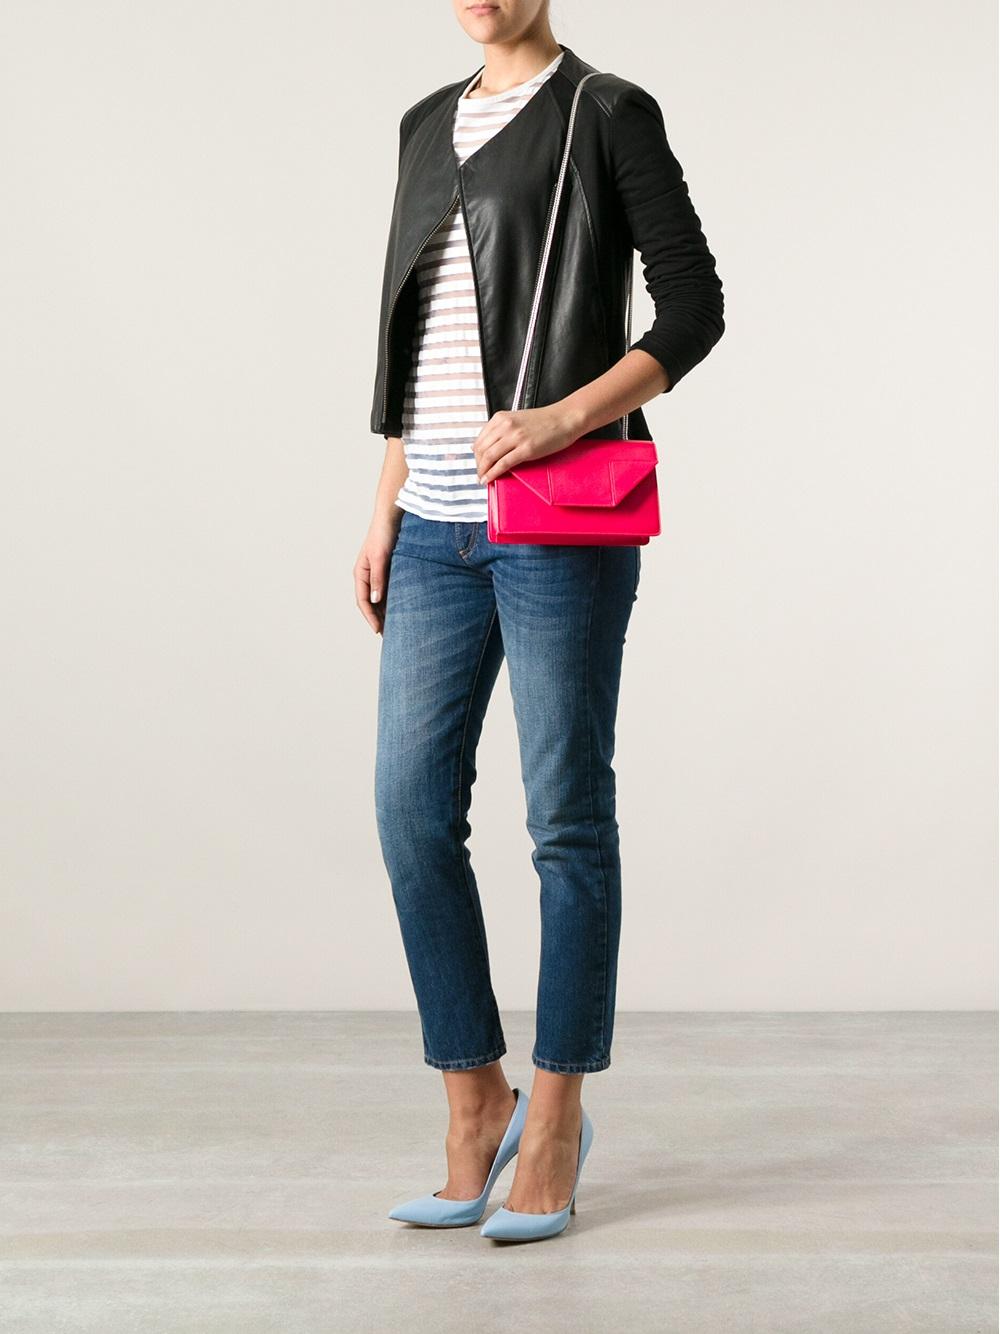 ded56428376 Saint Laurent Pink Classic Small Betty Bag